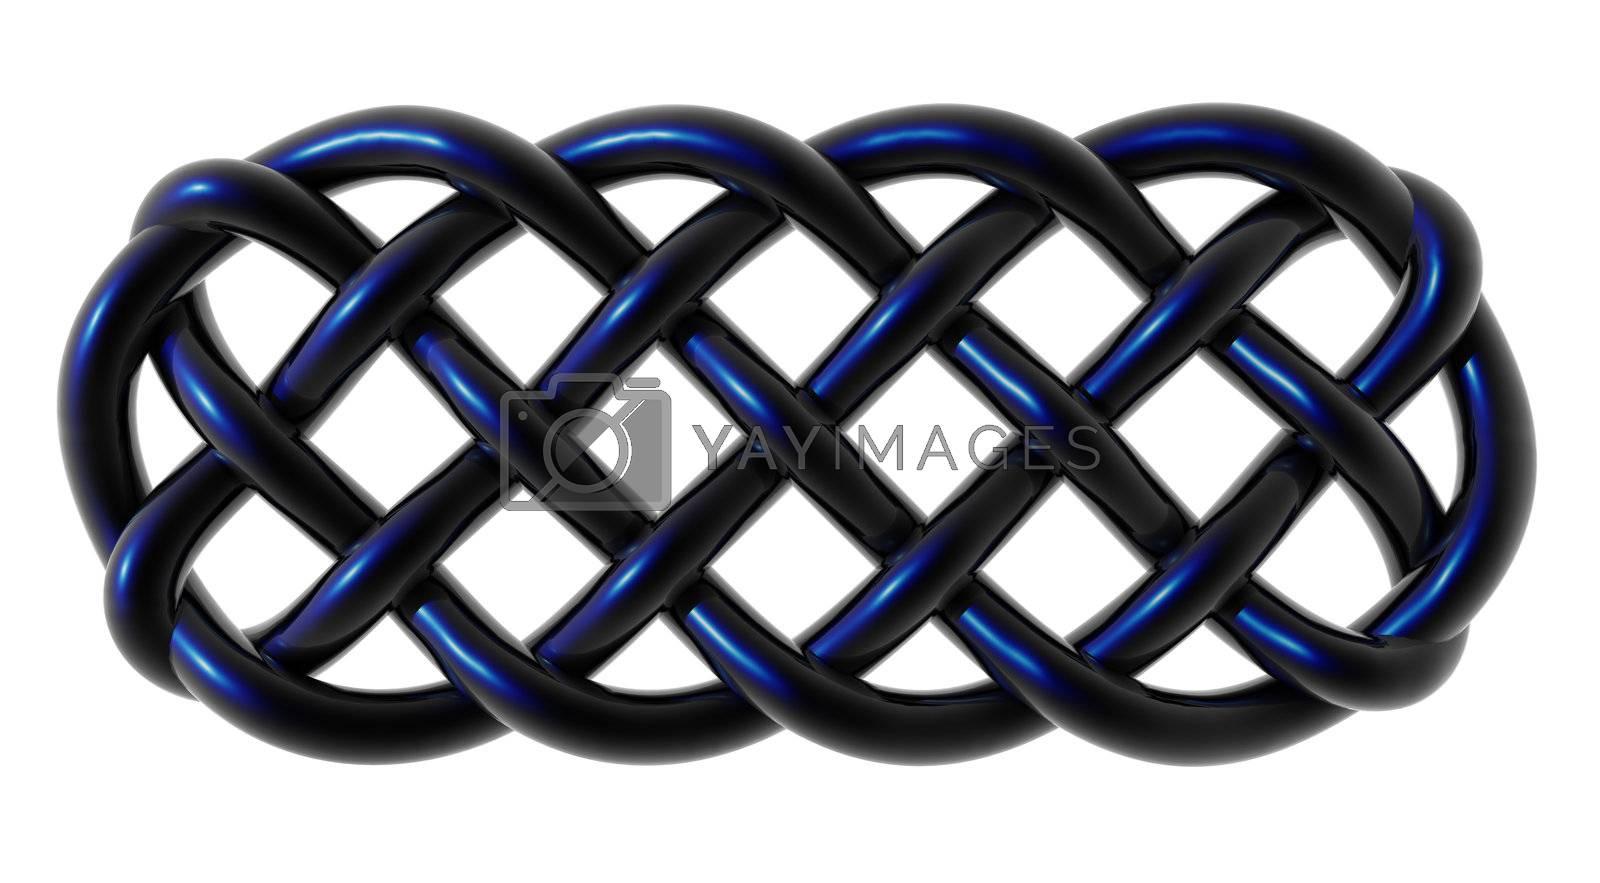 celtic knots ornament on white background - 3d illustration